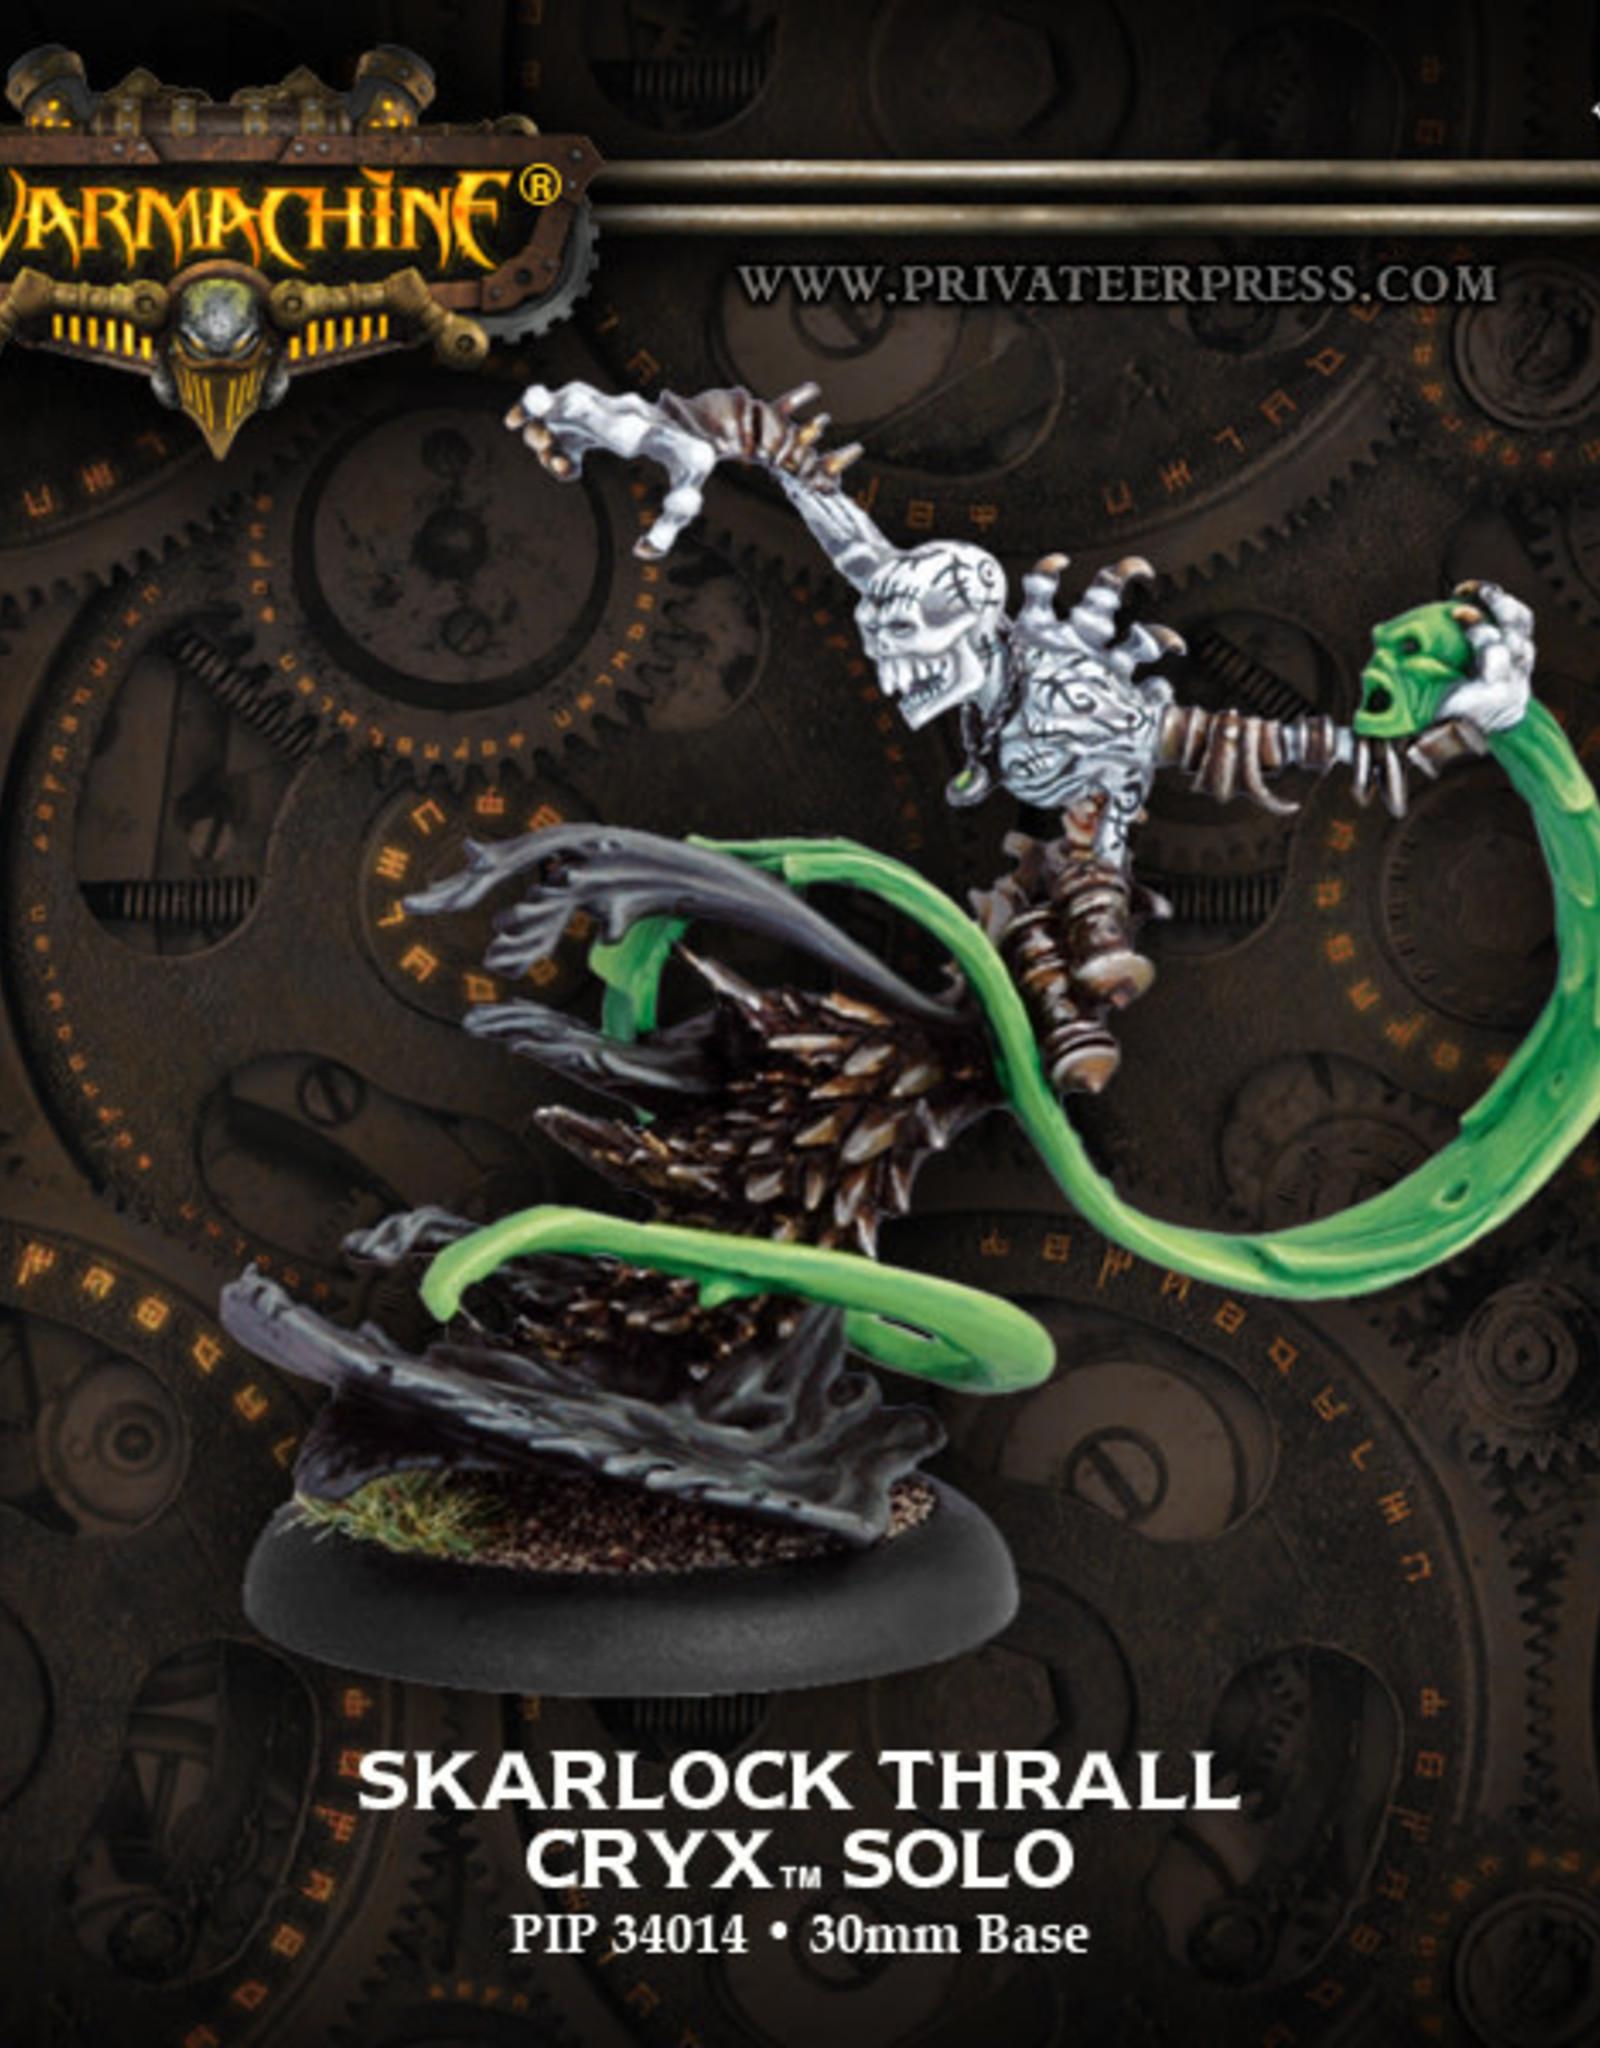 Warmachine Cryx - Skarlock Thrall